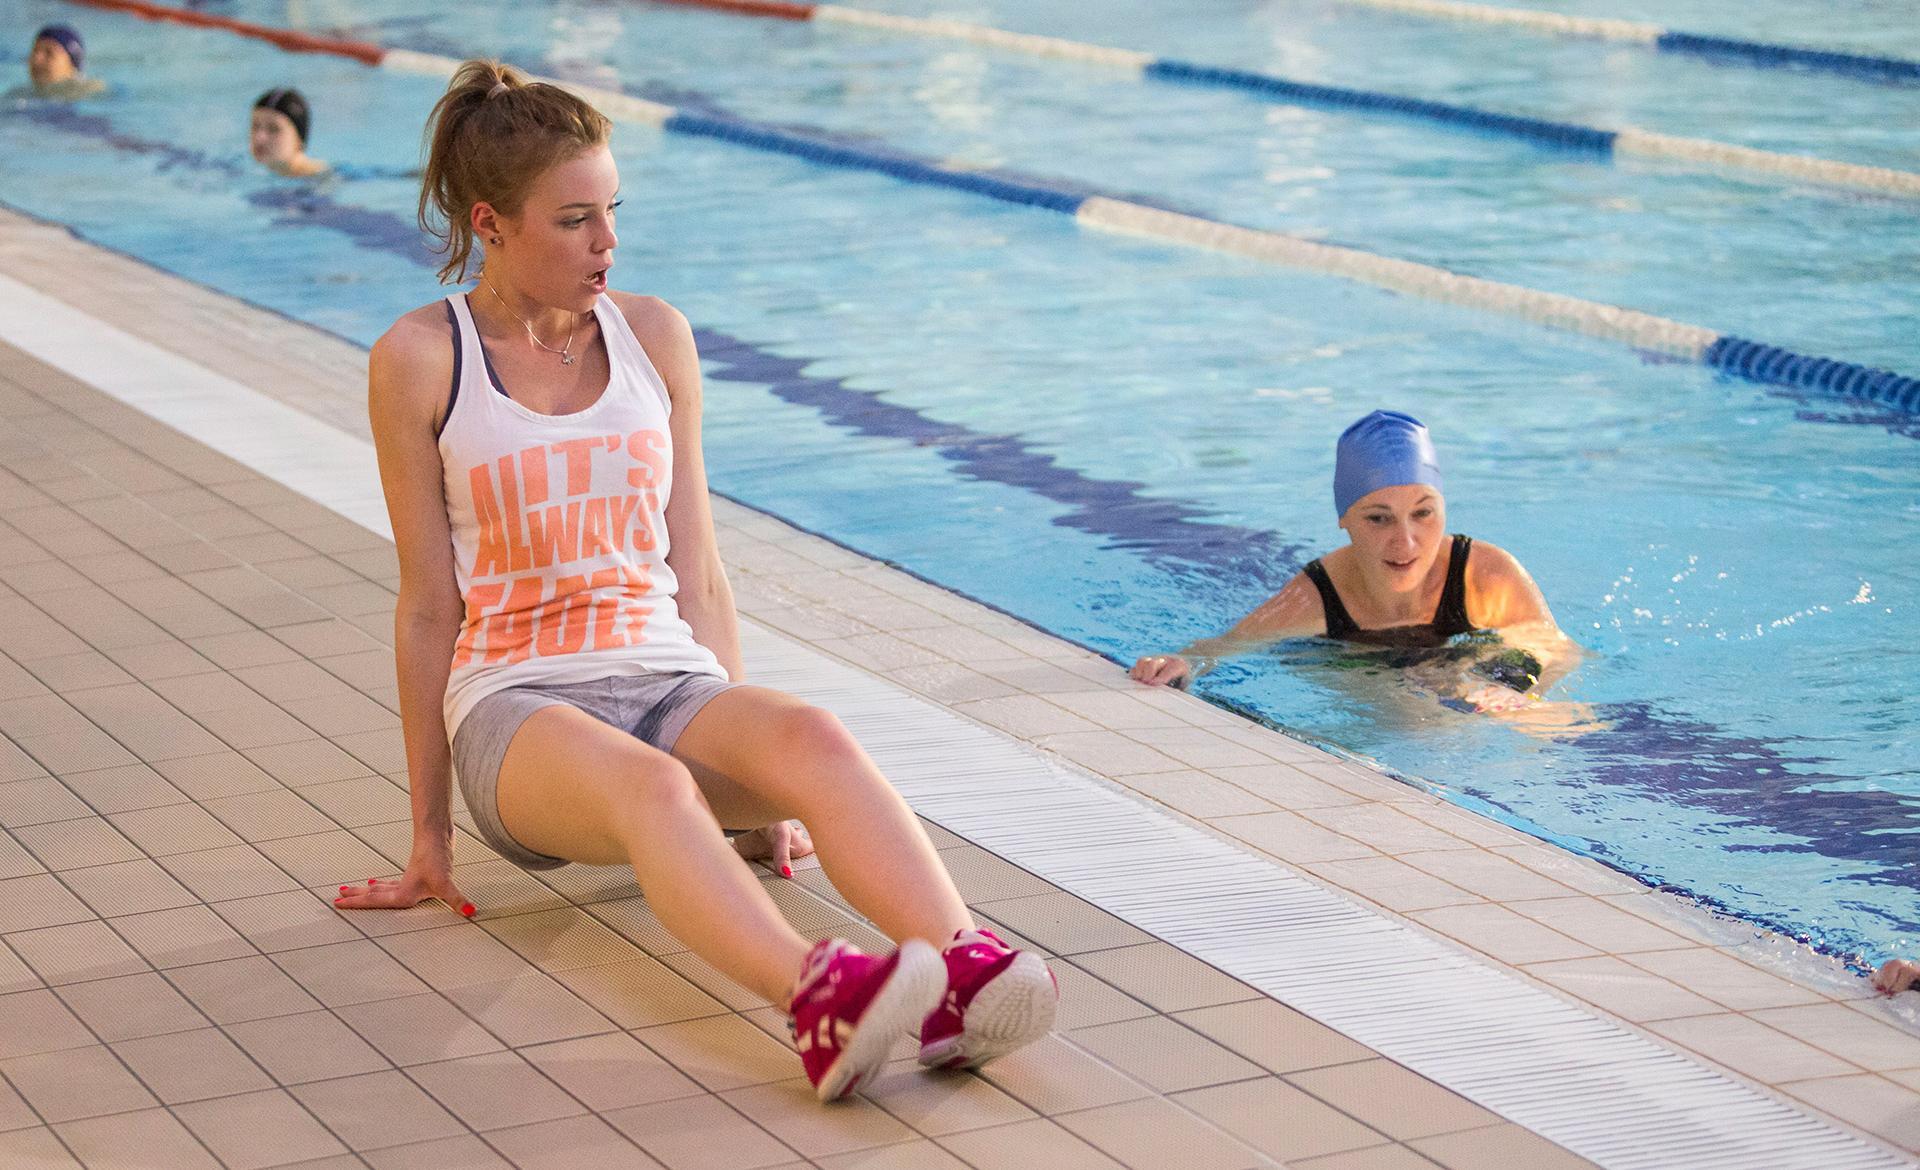 zajęcia aqua aerobic